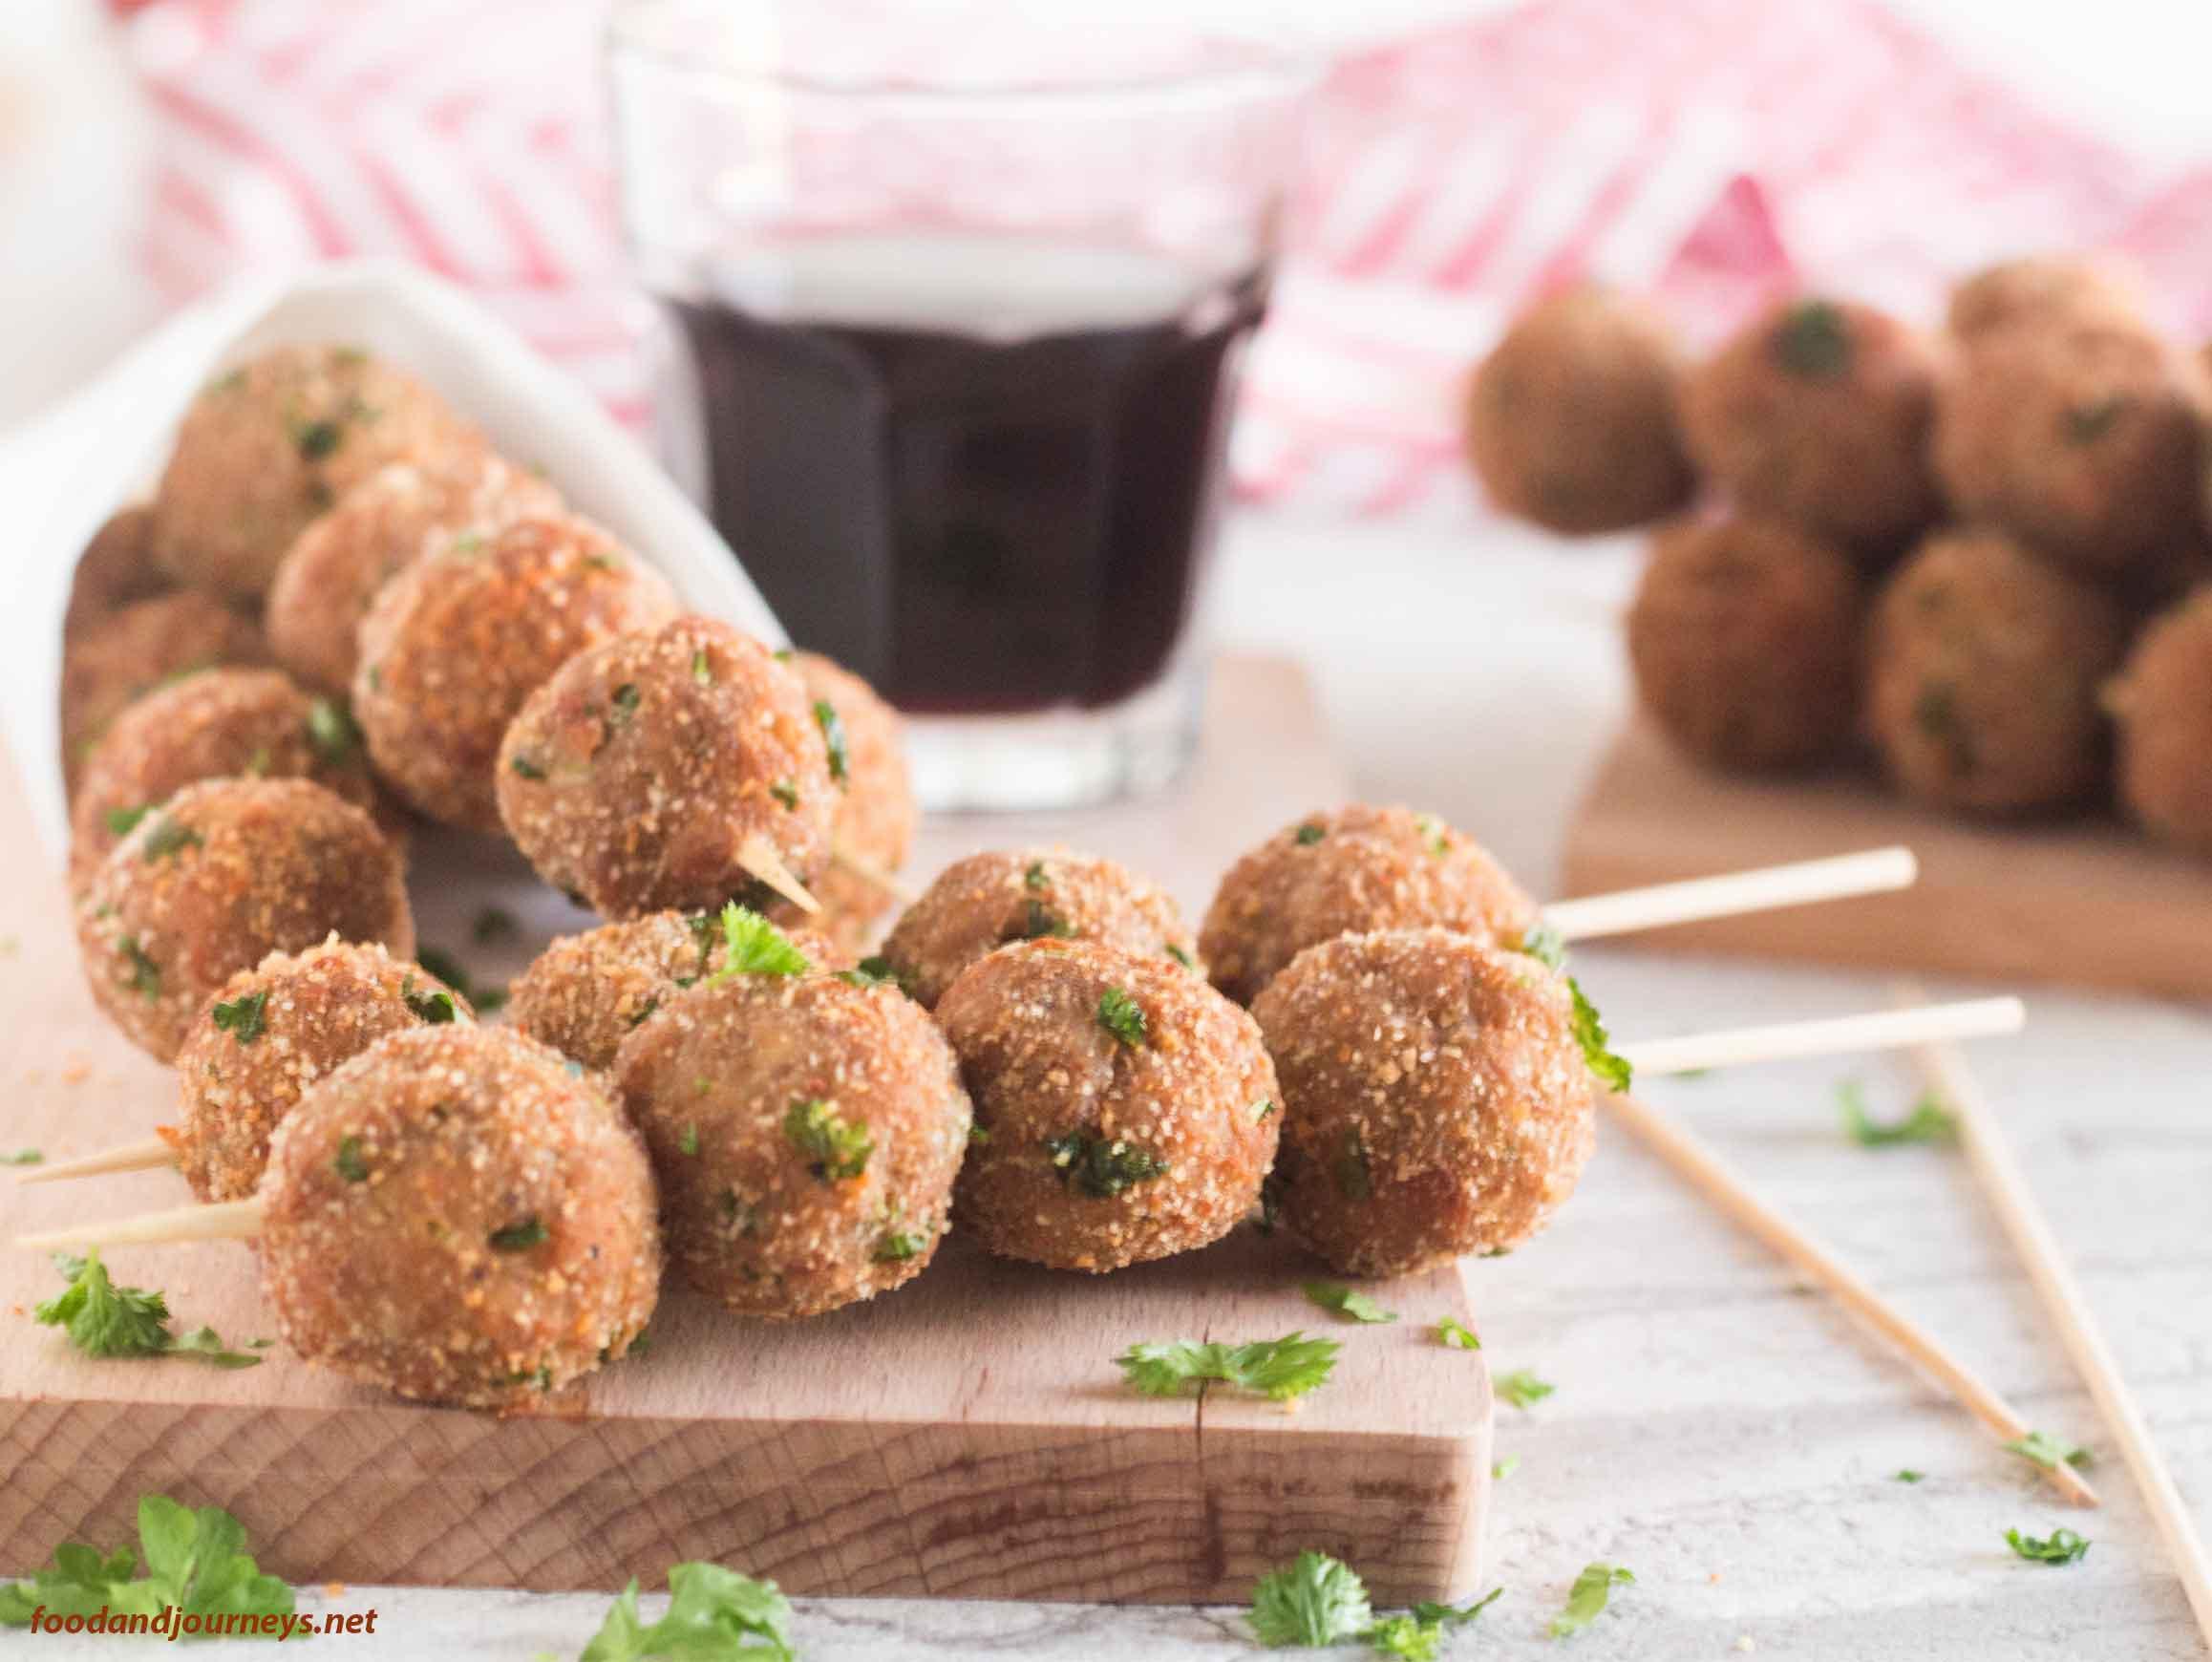 Image of Mini Meatballs on a Skewer, ready for serving|foodandjourneys.net